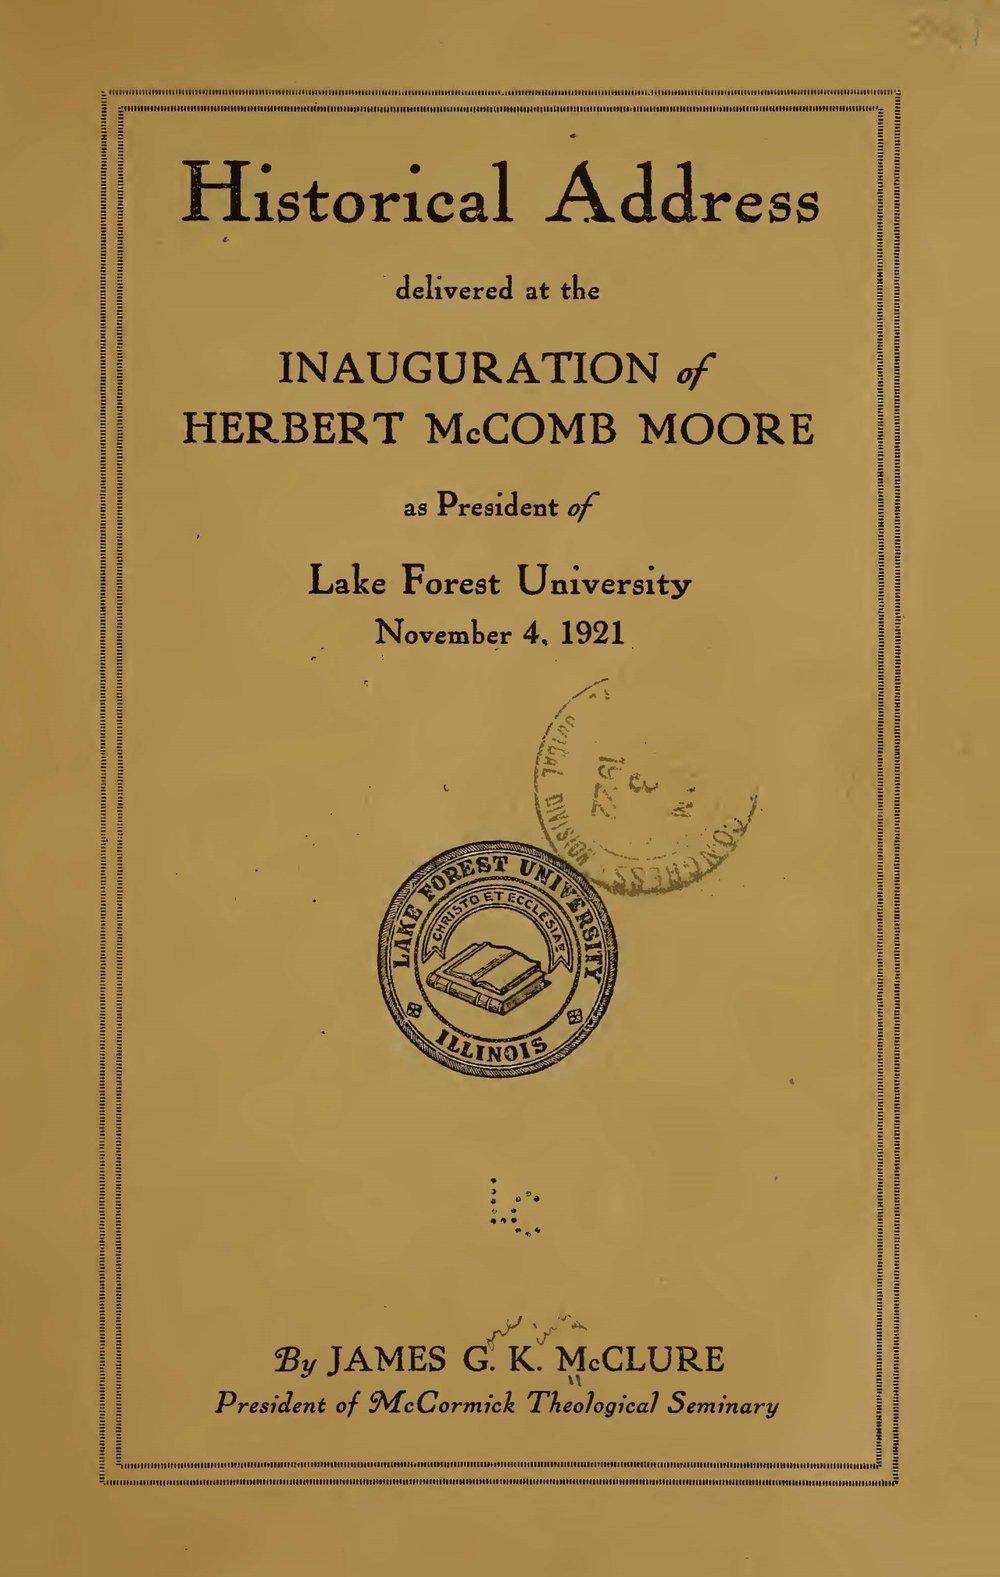 McClure, Sr., James Gore King, Historical Address Title Page.jpg